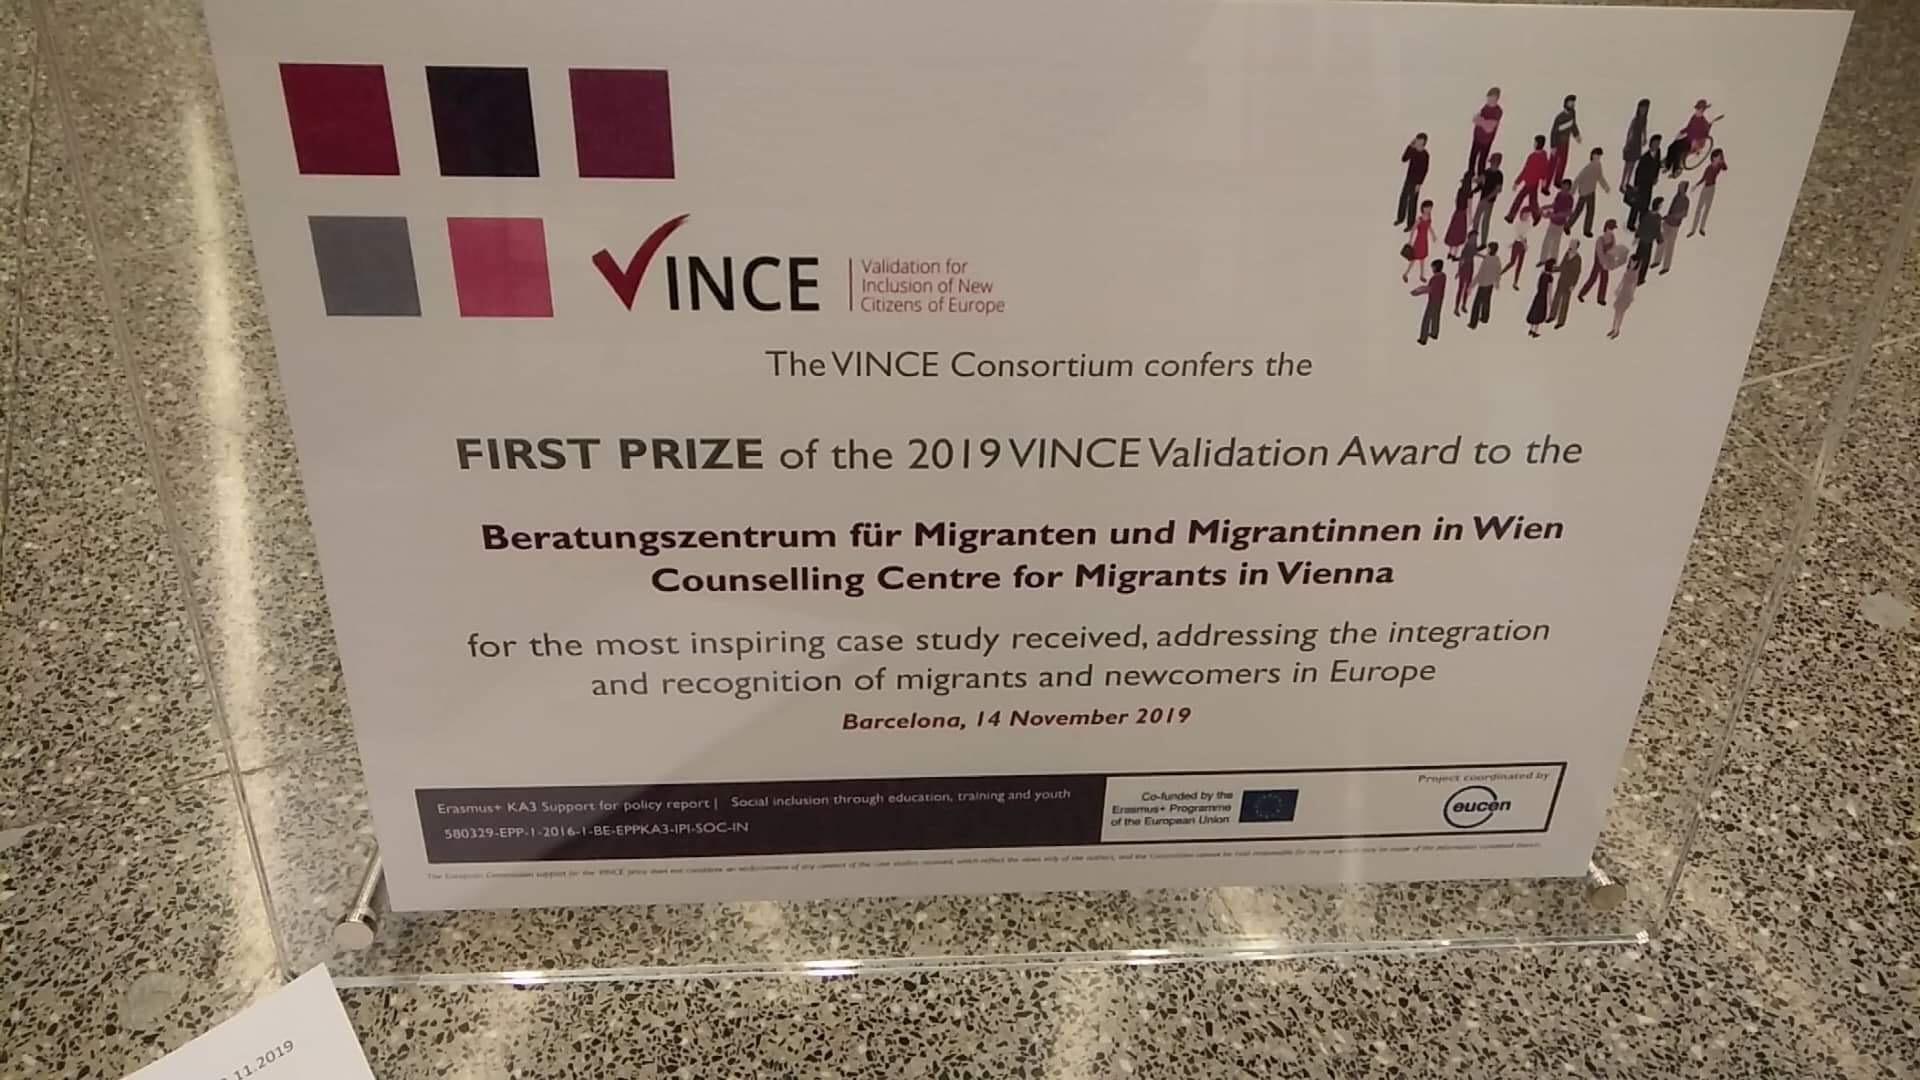 VINCE prize 2019